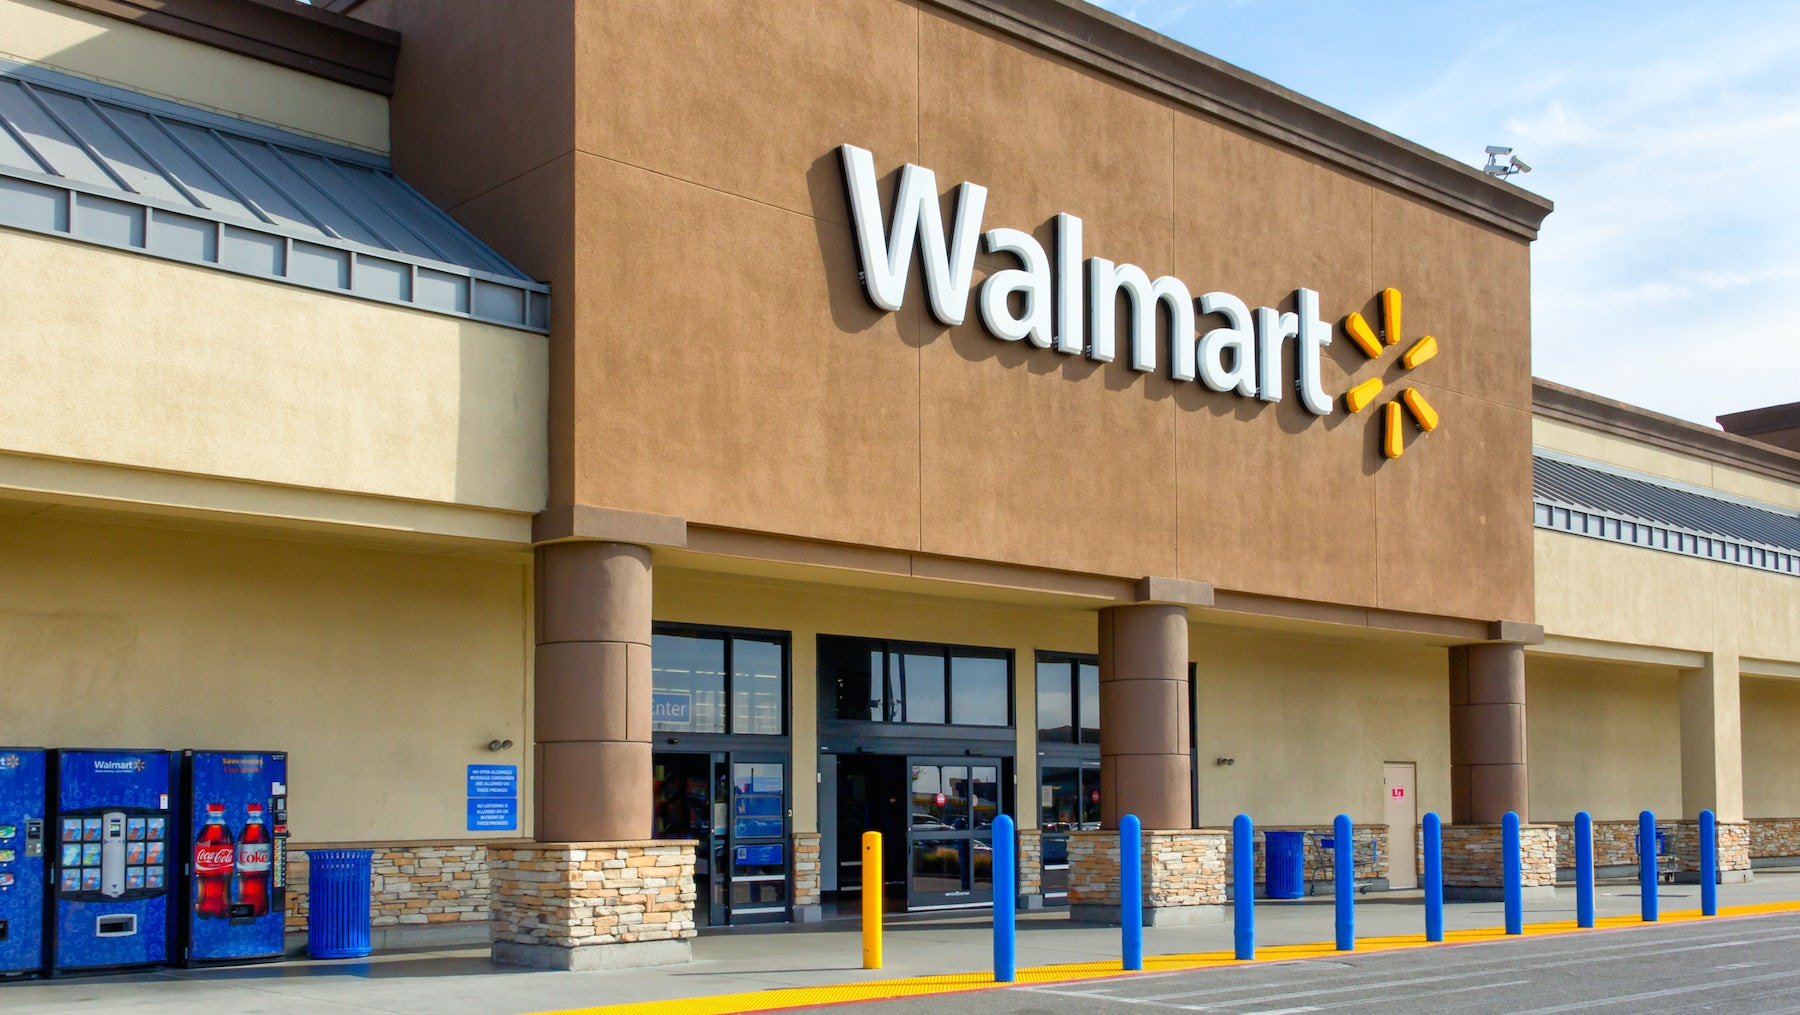 Walmart store front | Source: Shutterstock